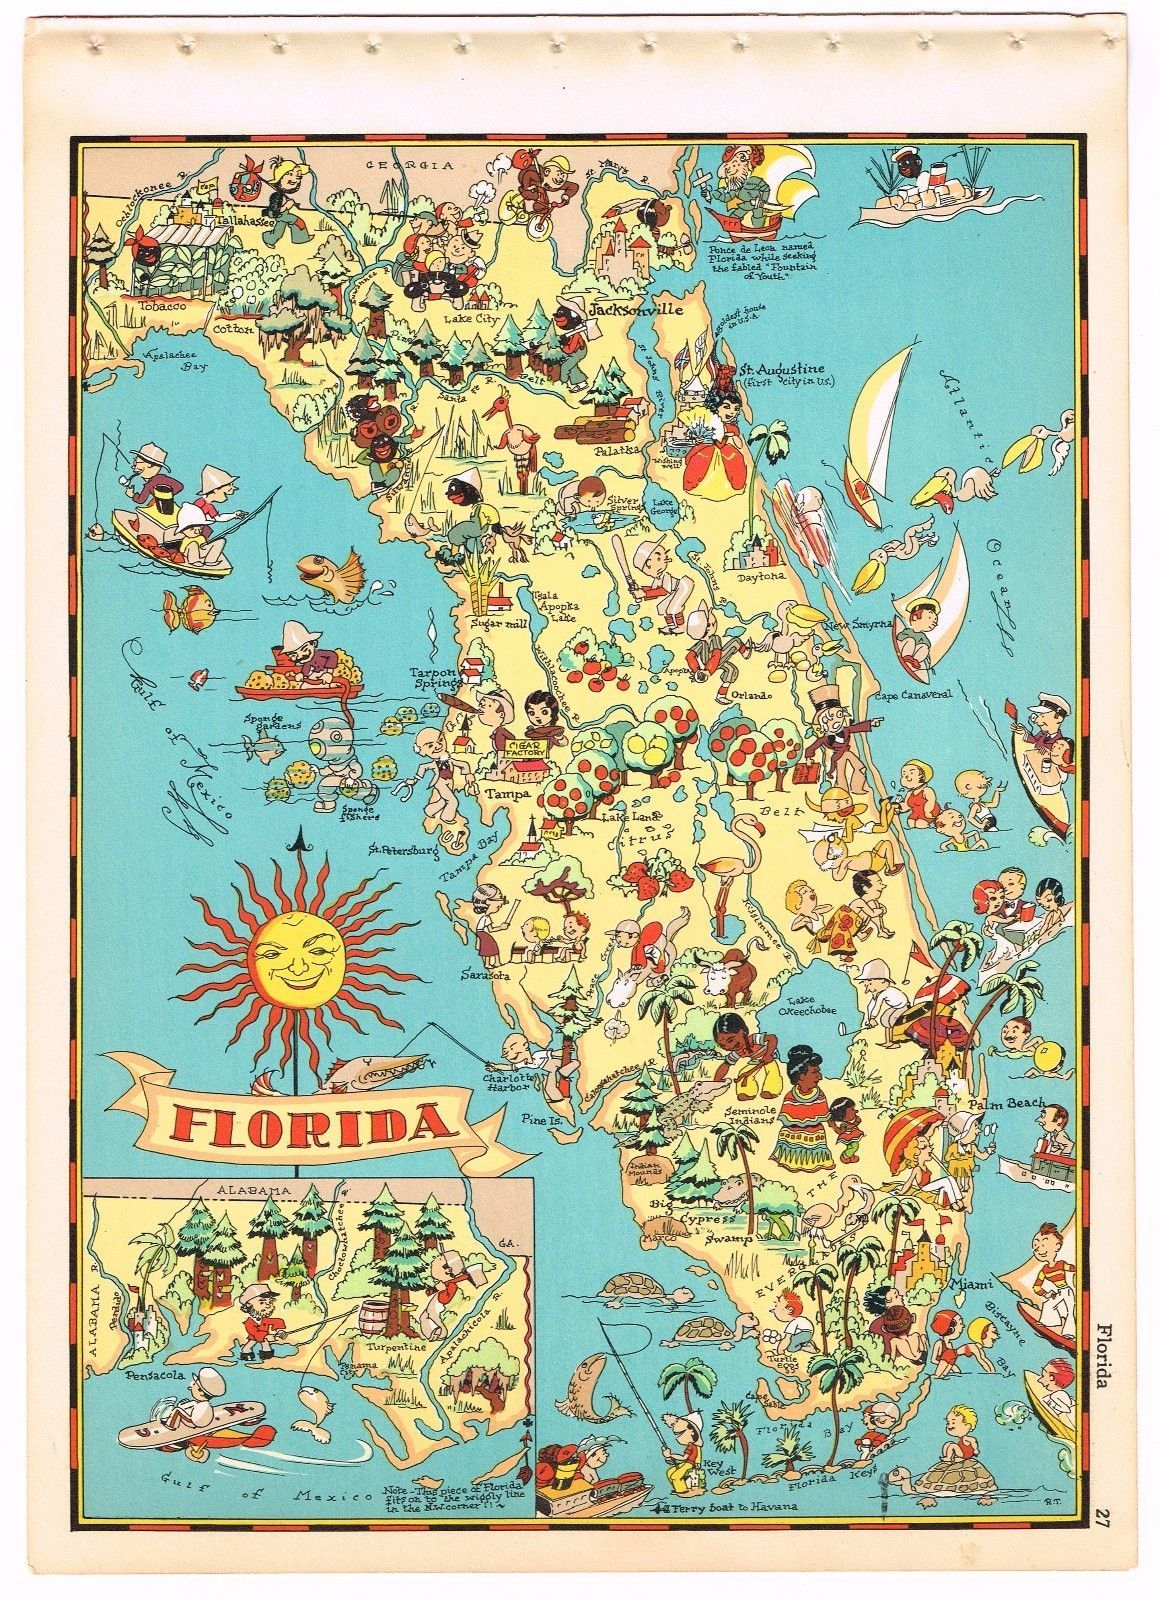 Genuine Ruth Taylor Vintage Florida Map Cartoon Rare Pictorial 1935 - Vintage Florida Map Poster